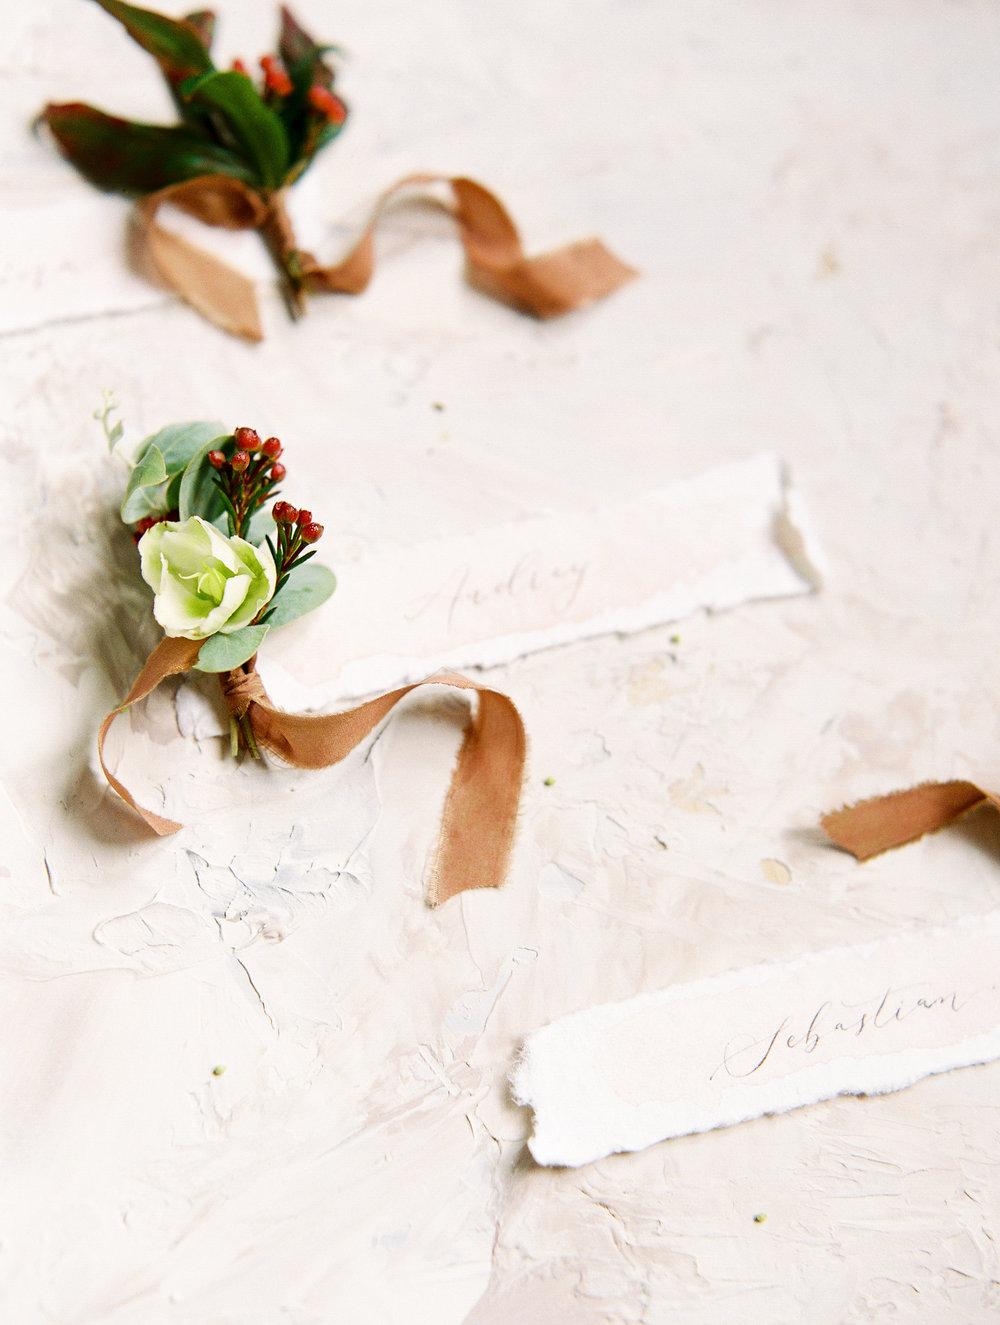 sandra-chau-stylist-floral-florist-branding-lifestyle-shoot-we-are-origami252.jpg